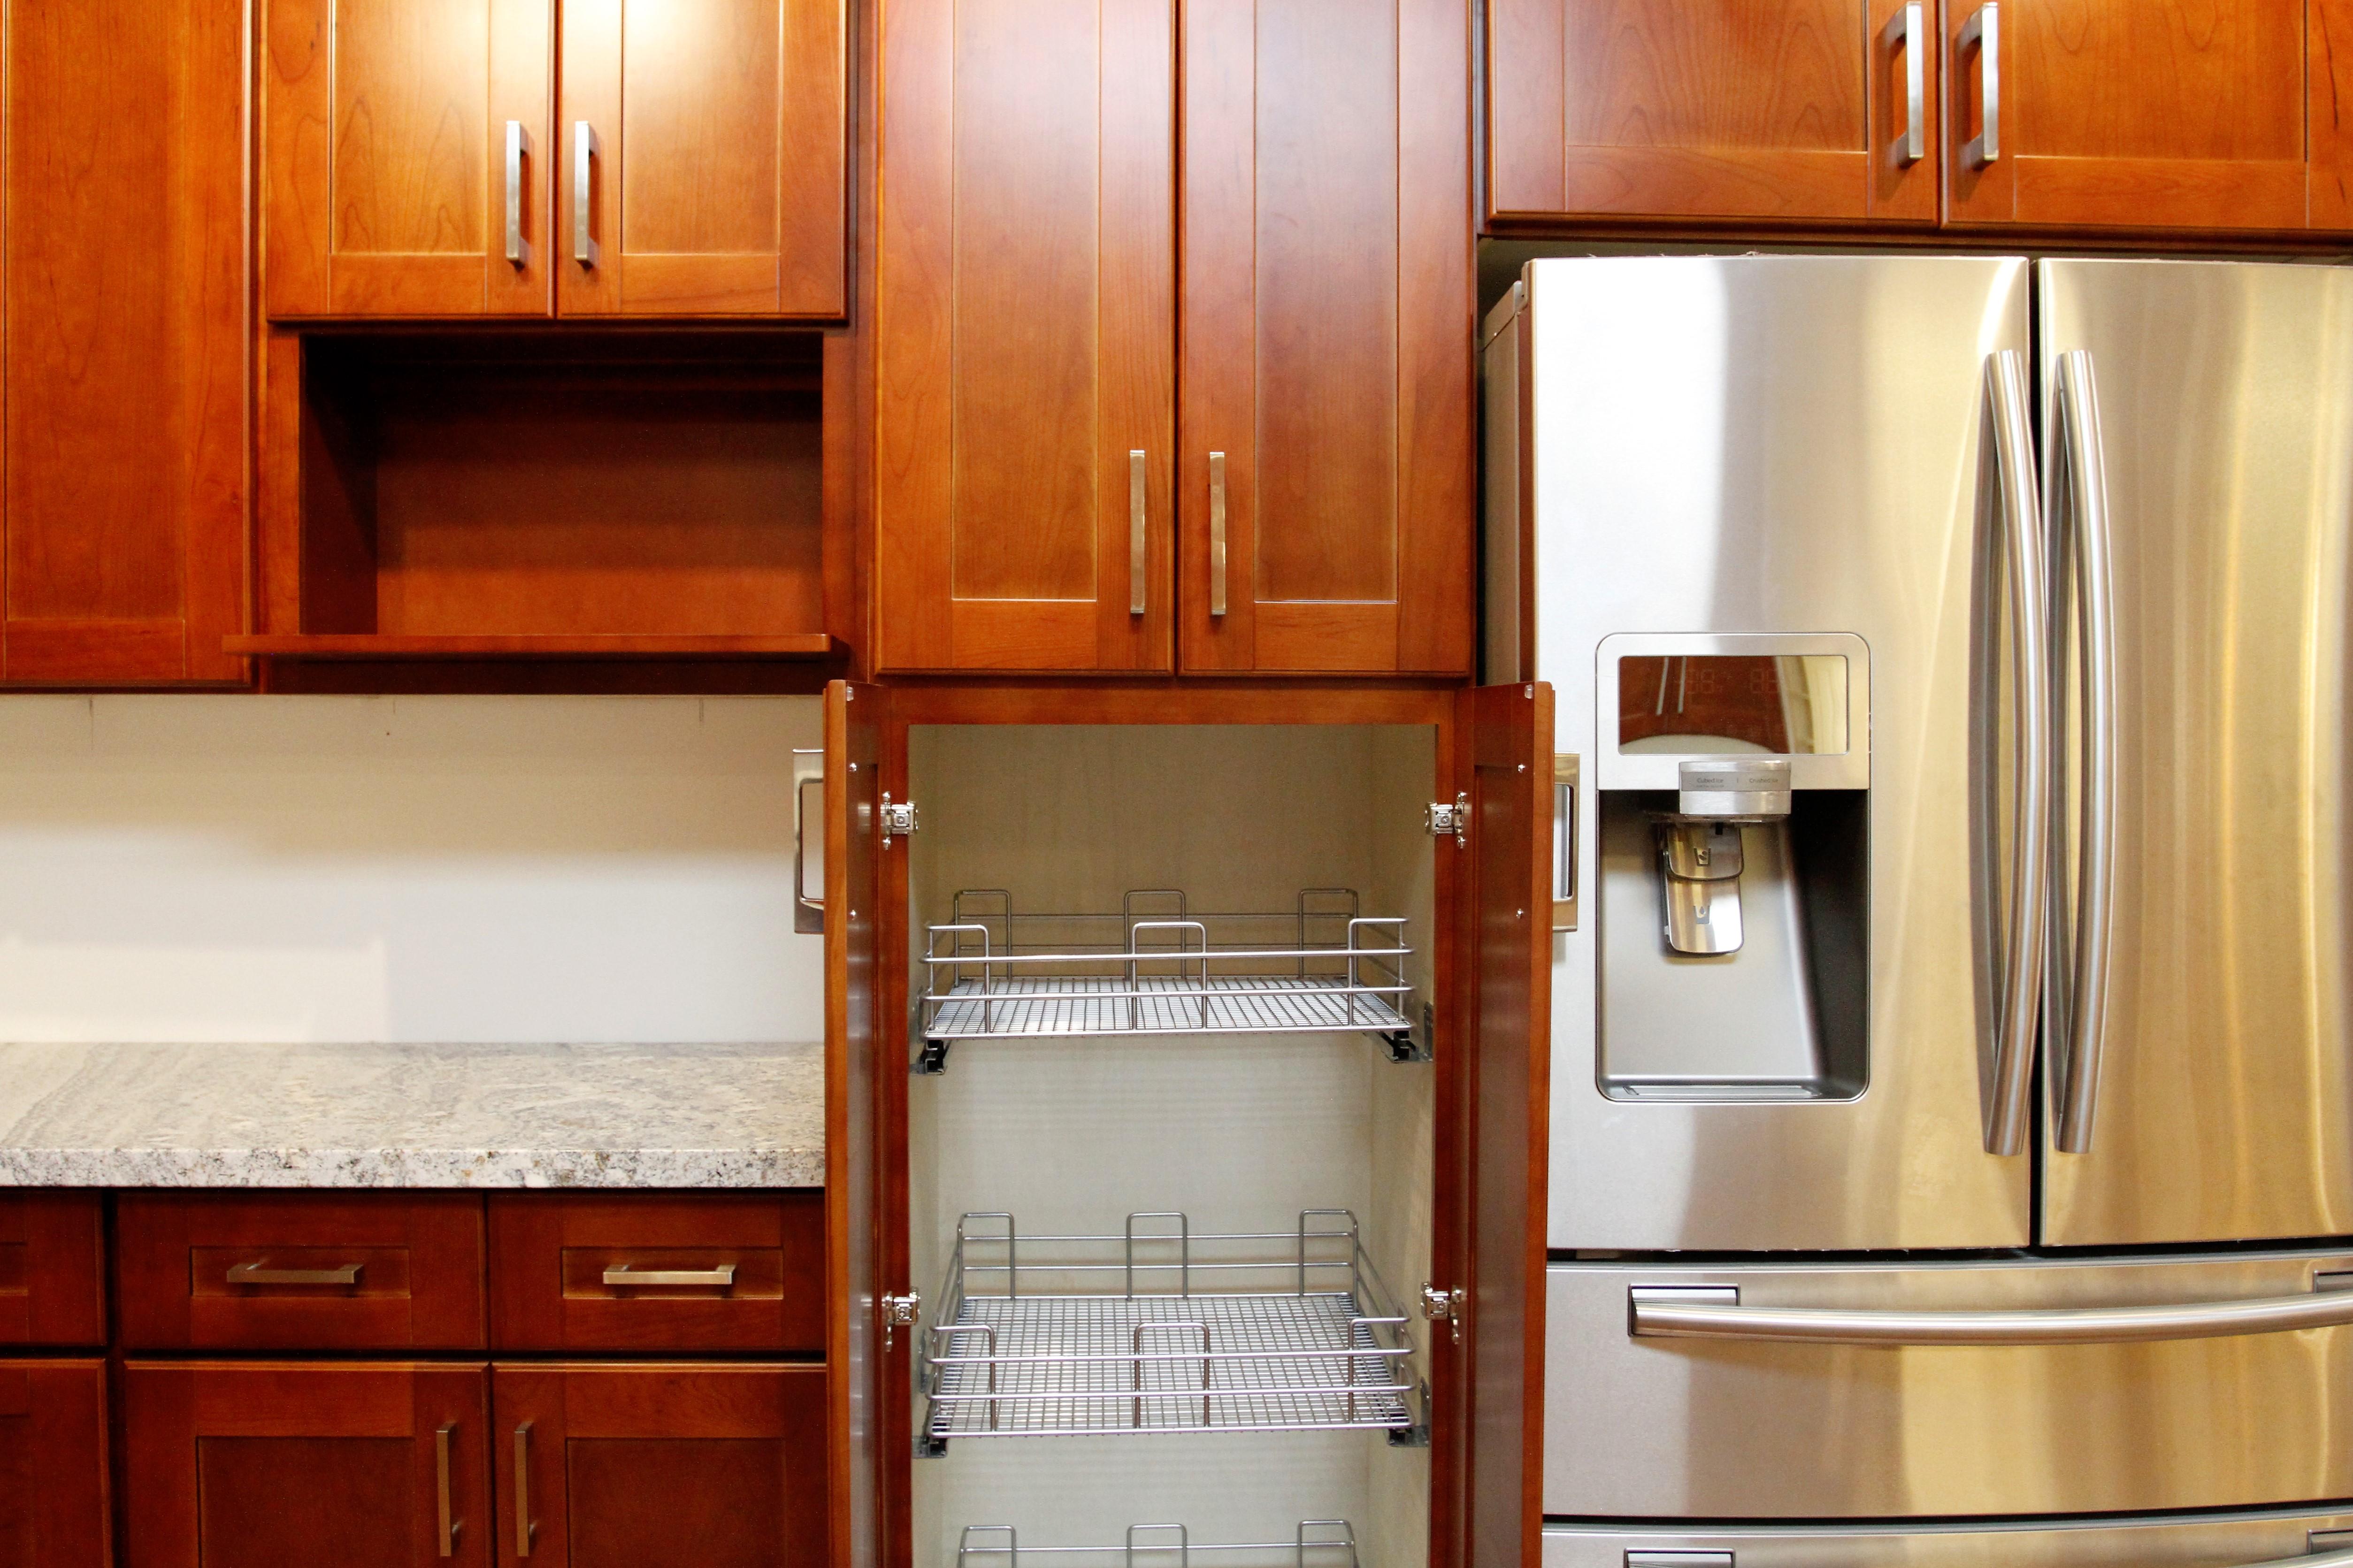 Cherry Shaker Cabinet Hayward San Jose Kz Kitchen